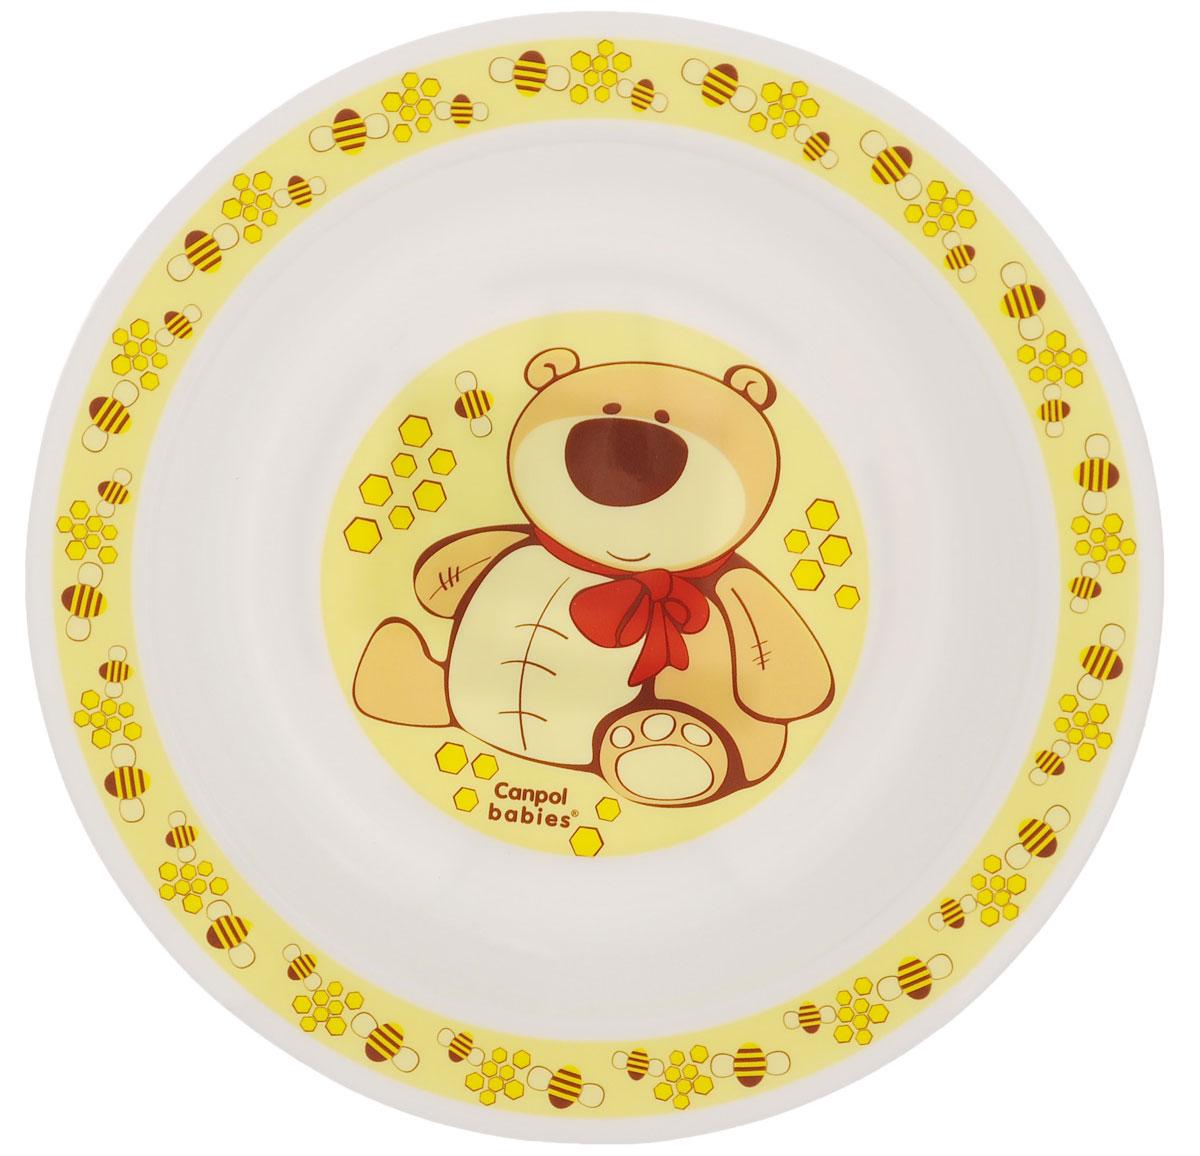 Тарелки для детей картинки